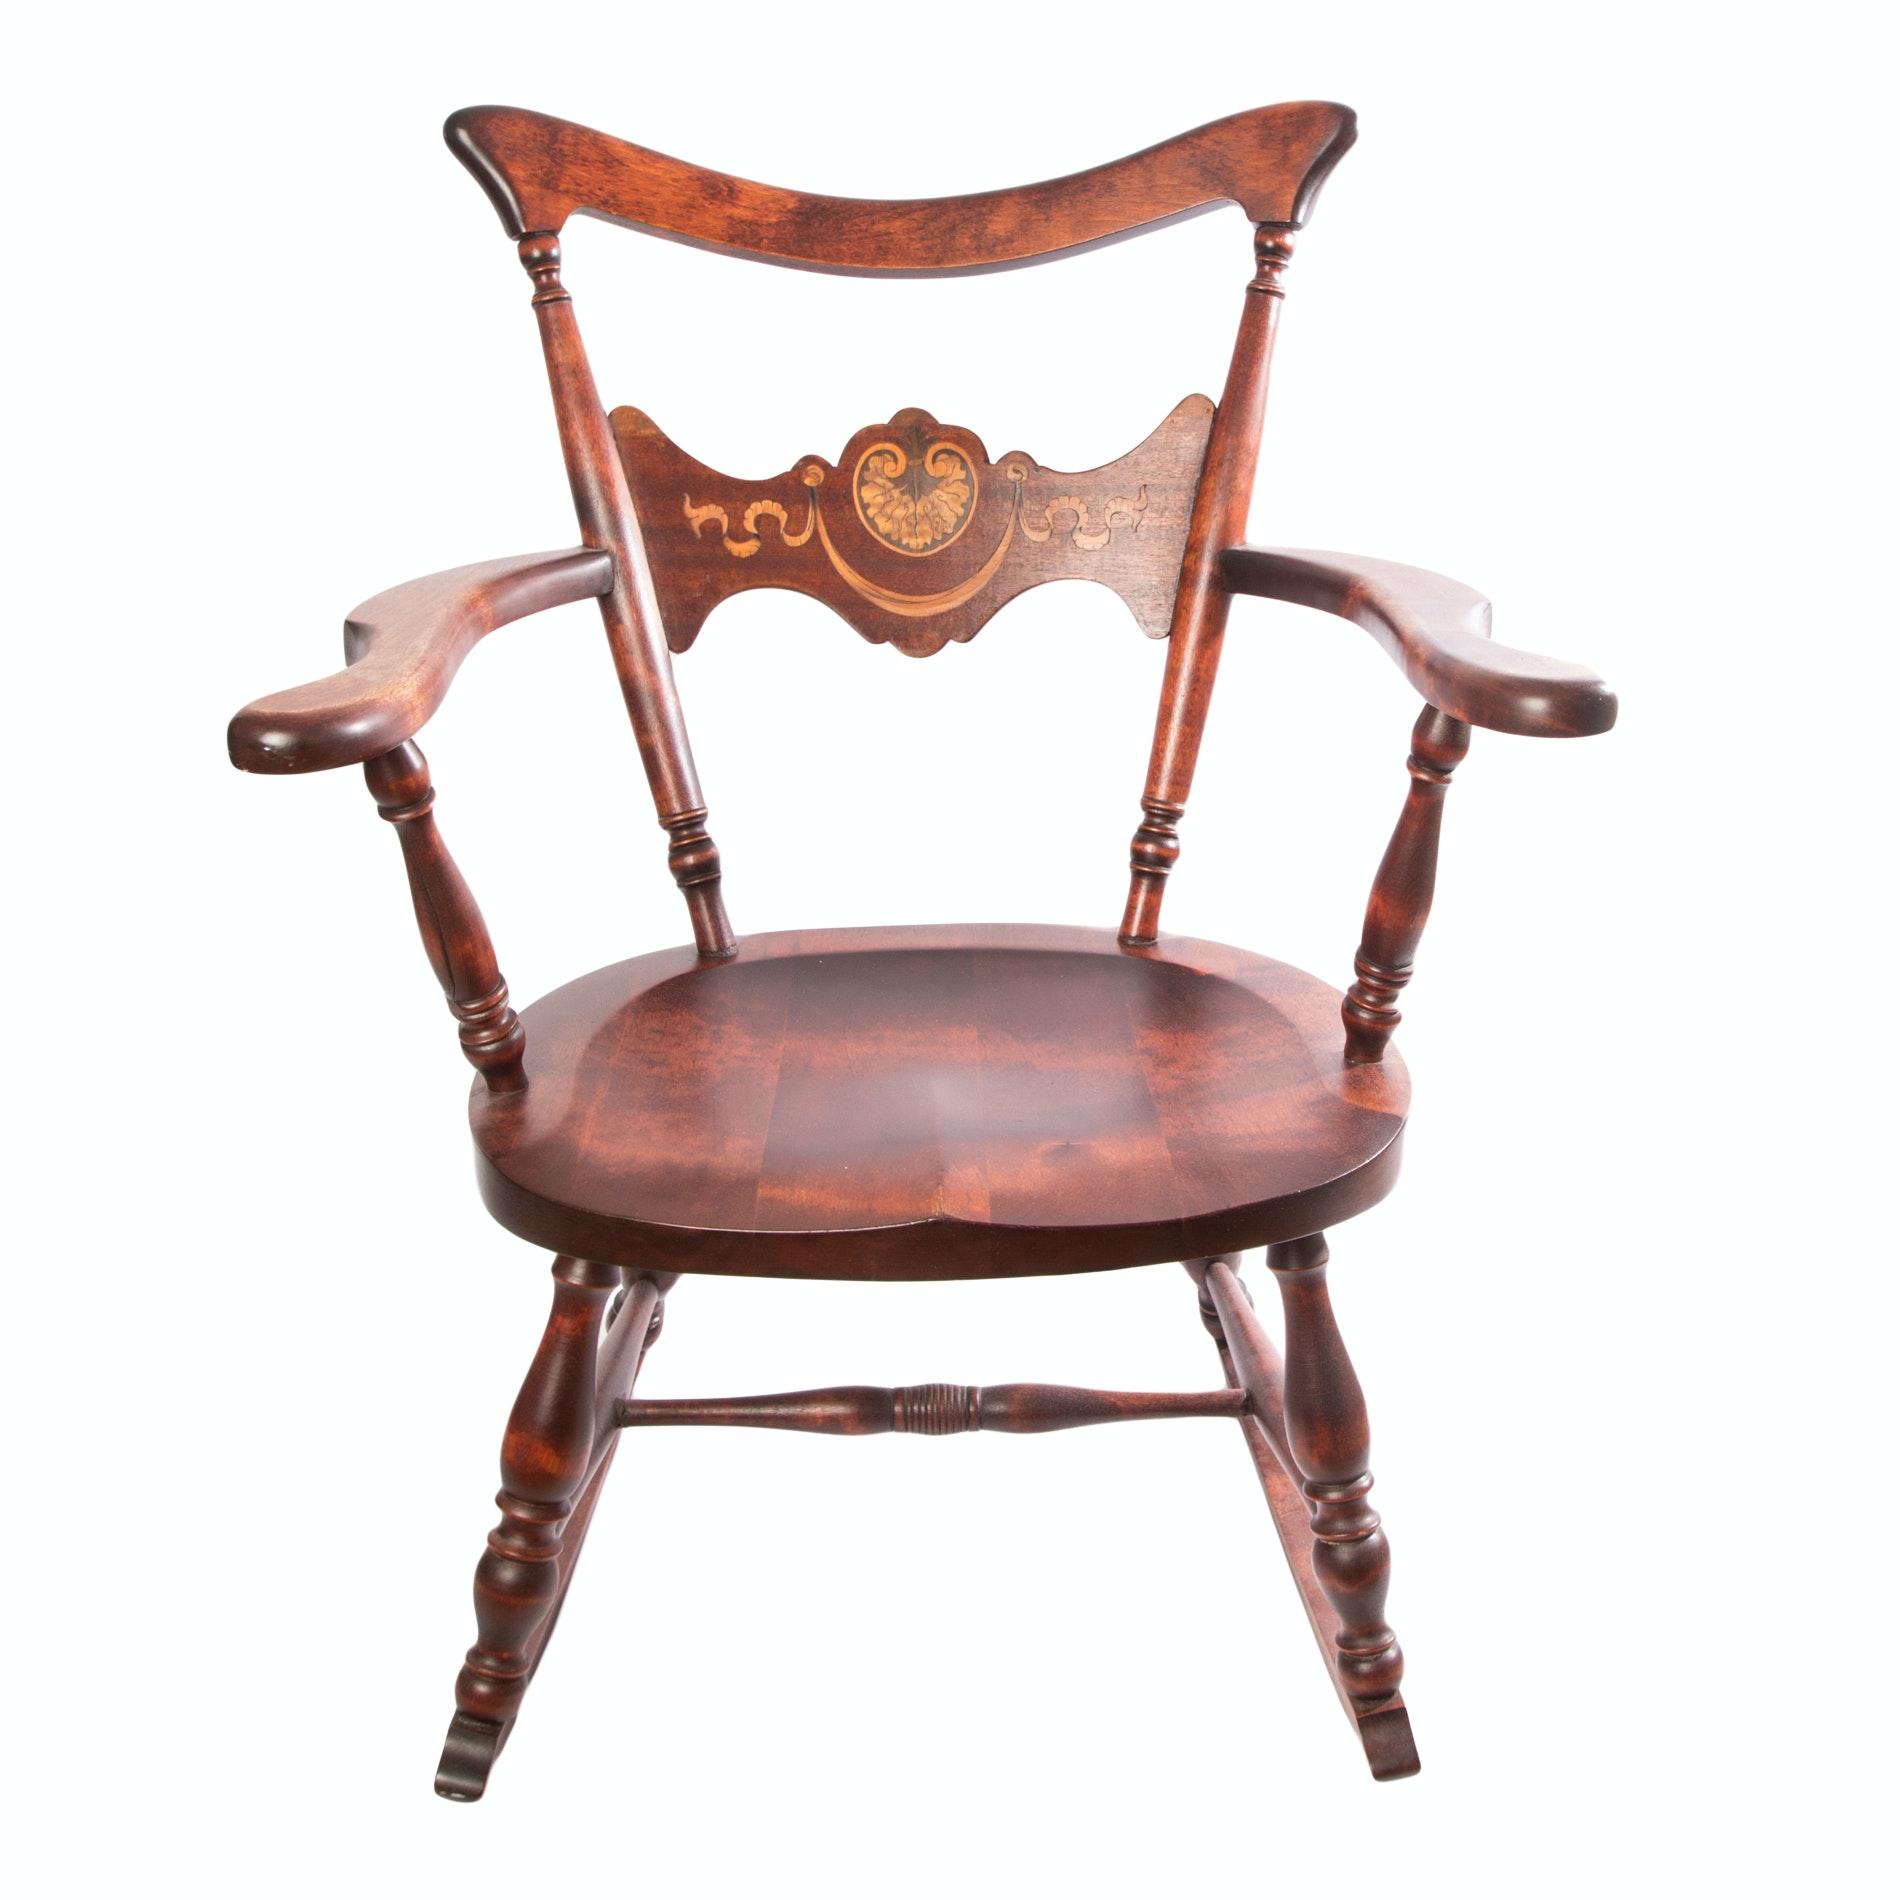 Early 20th Century Mahogany Rocking Chair